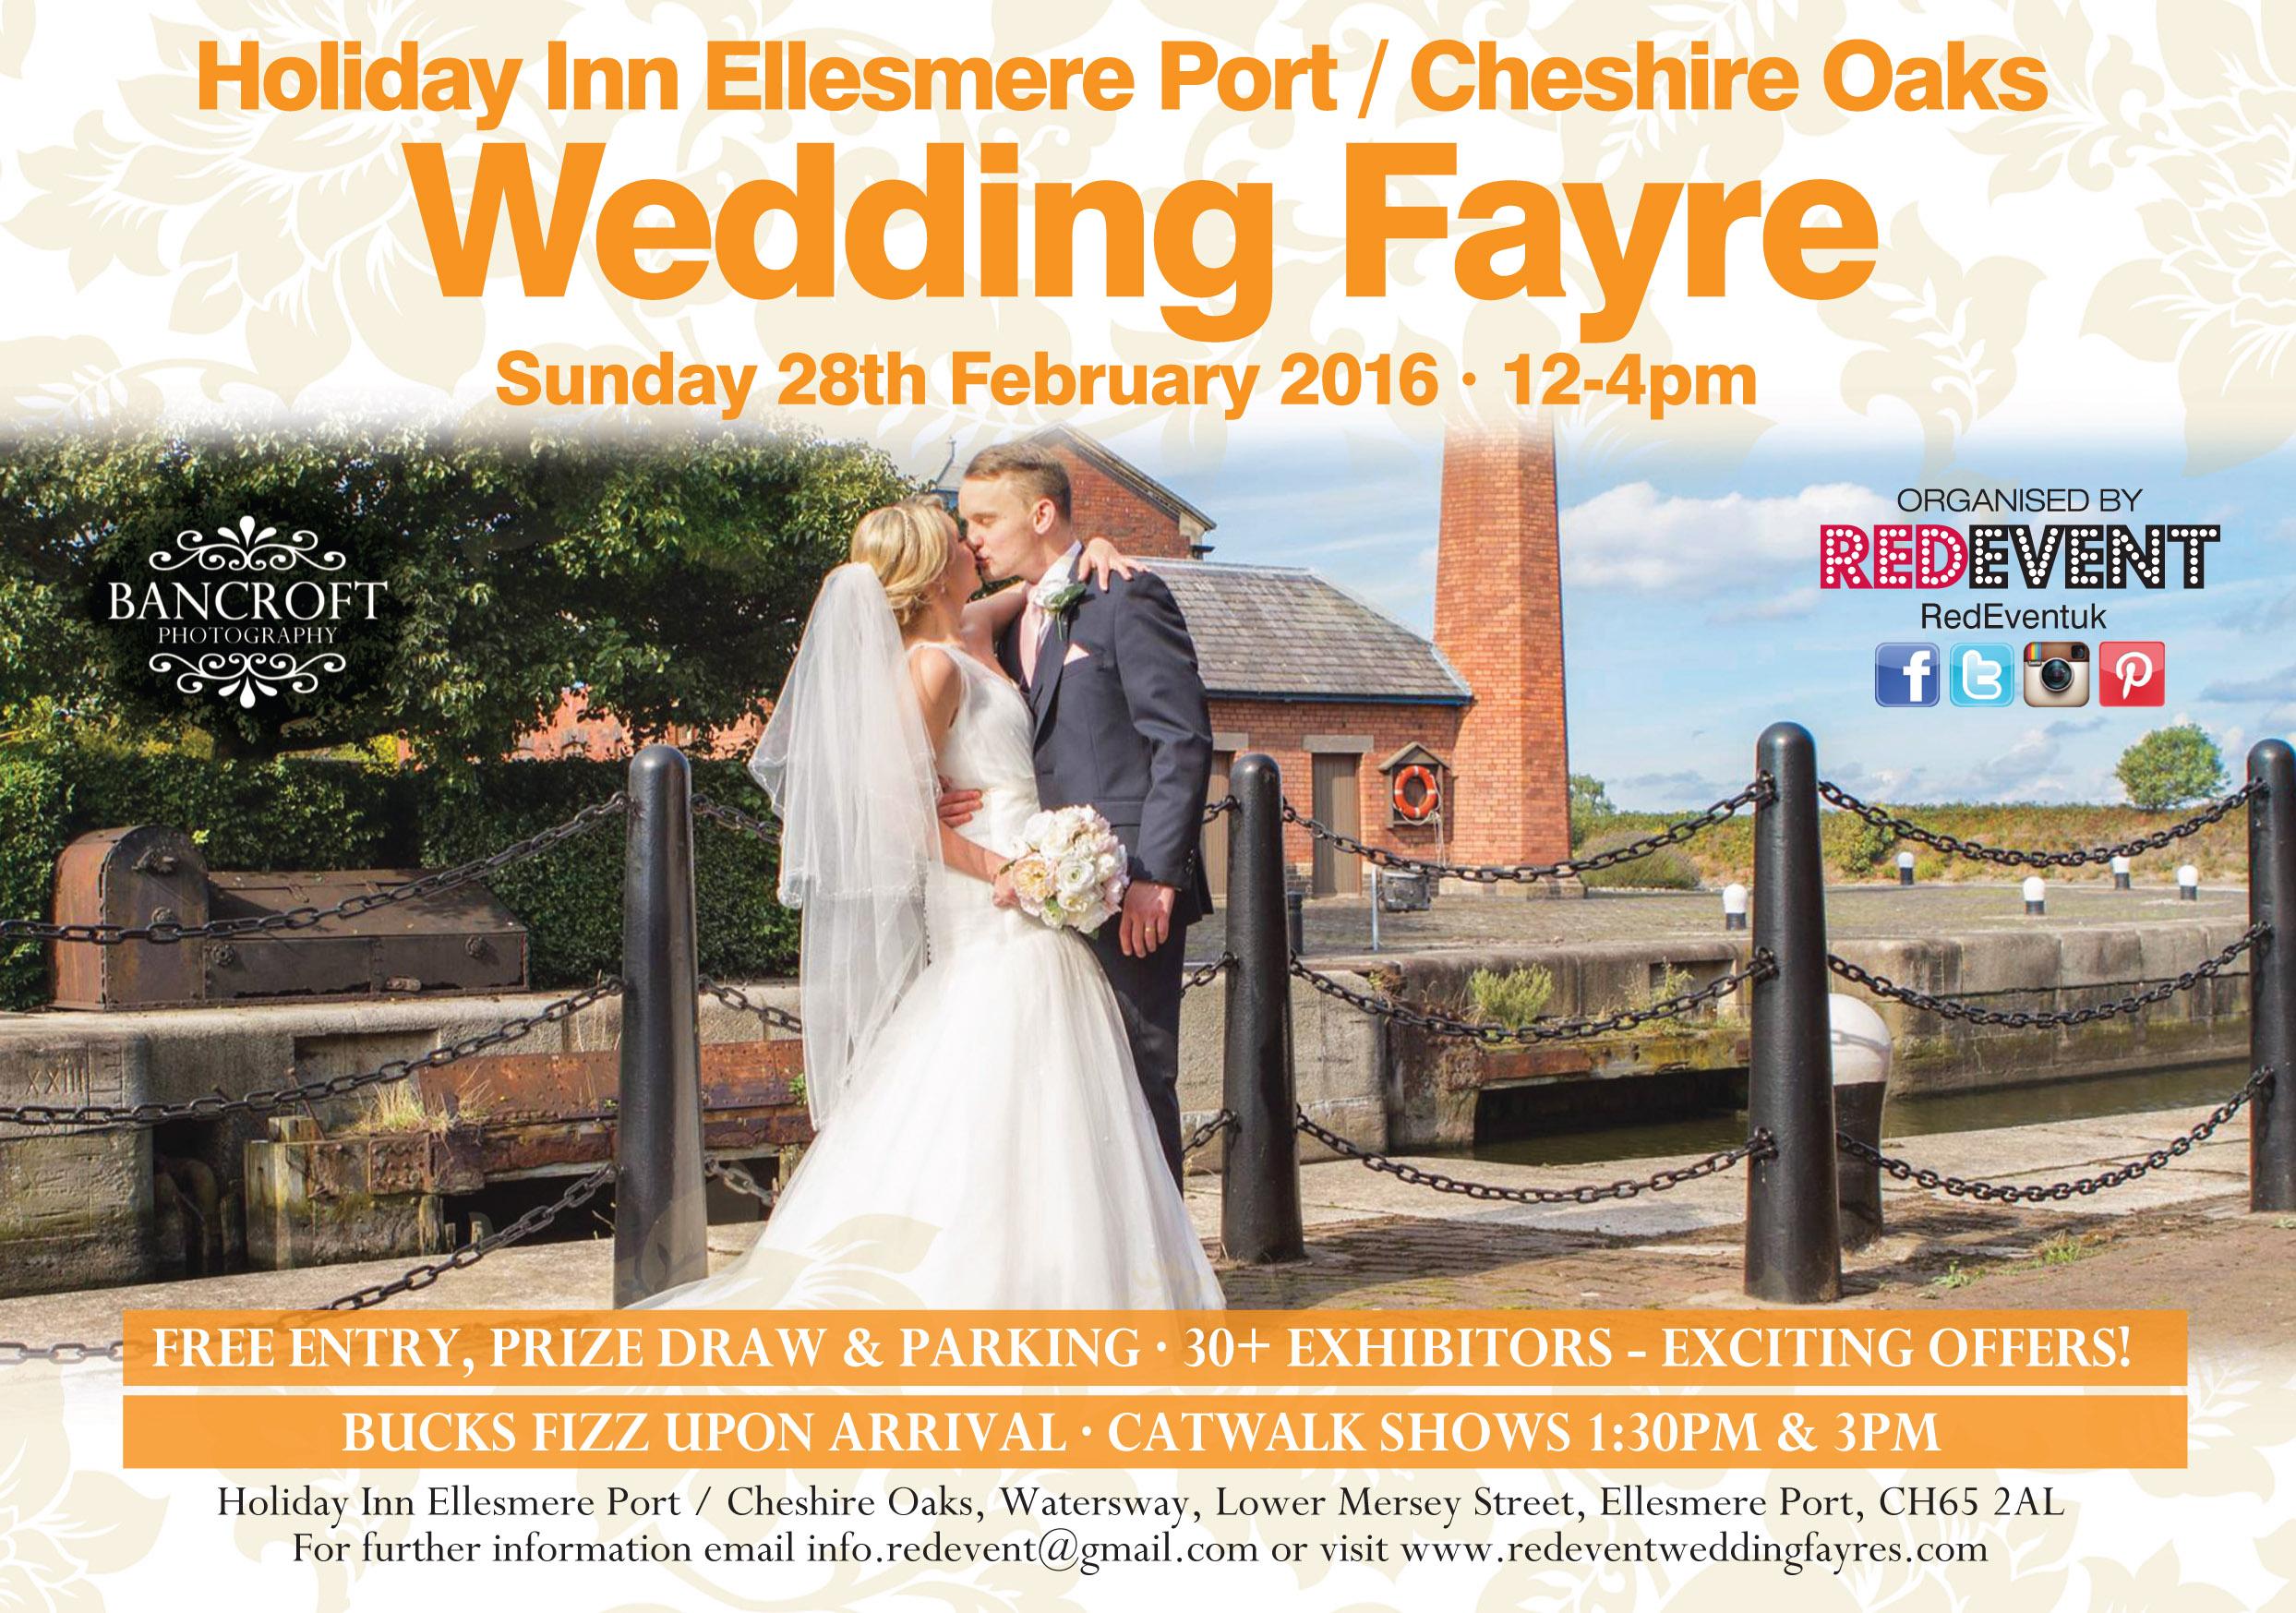 Holiday Inn Ellesmere Port Wedding Fayre